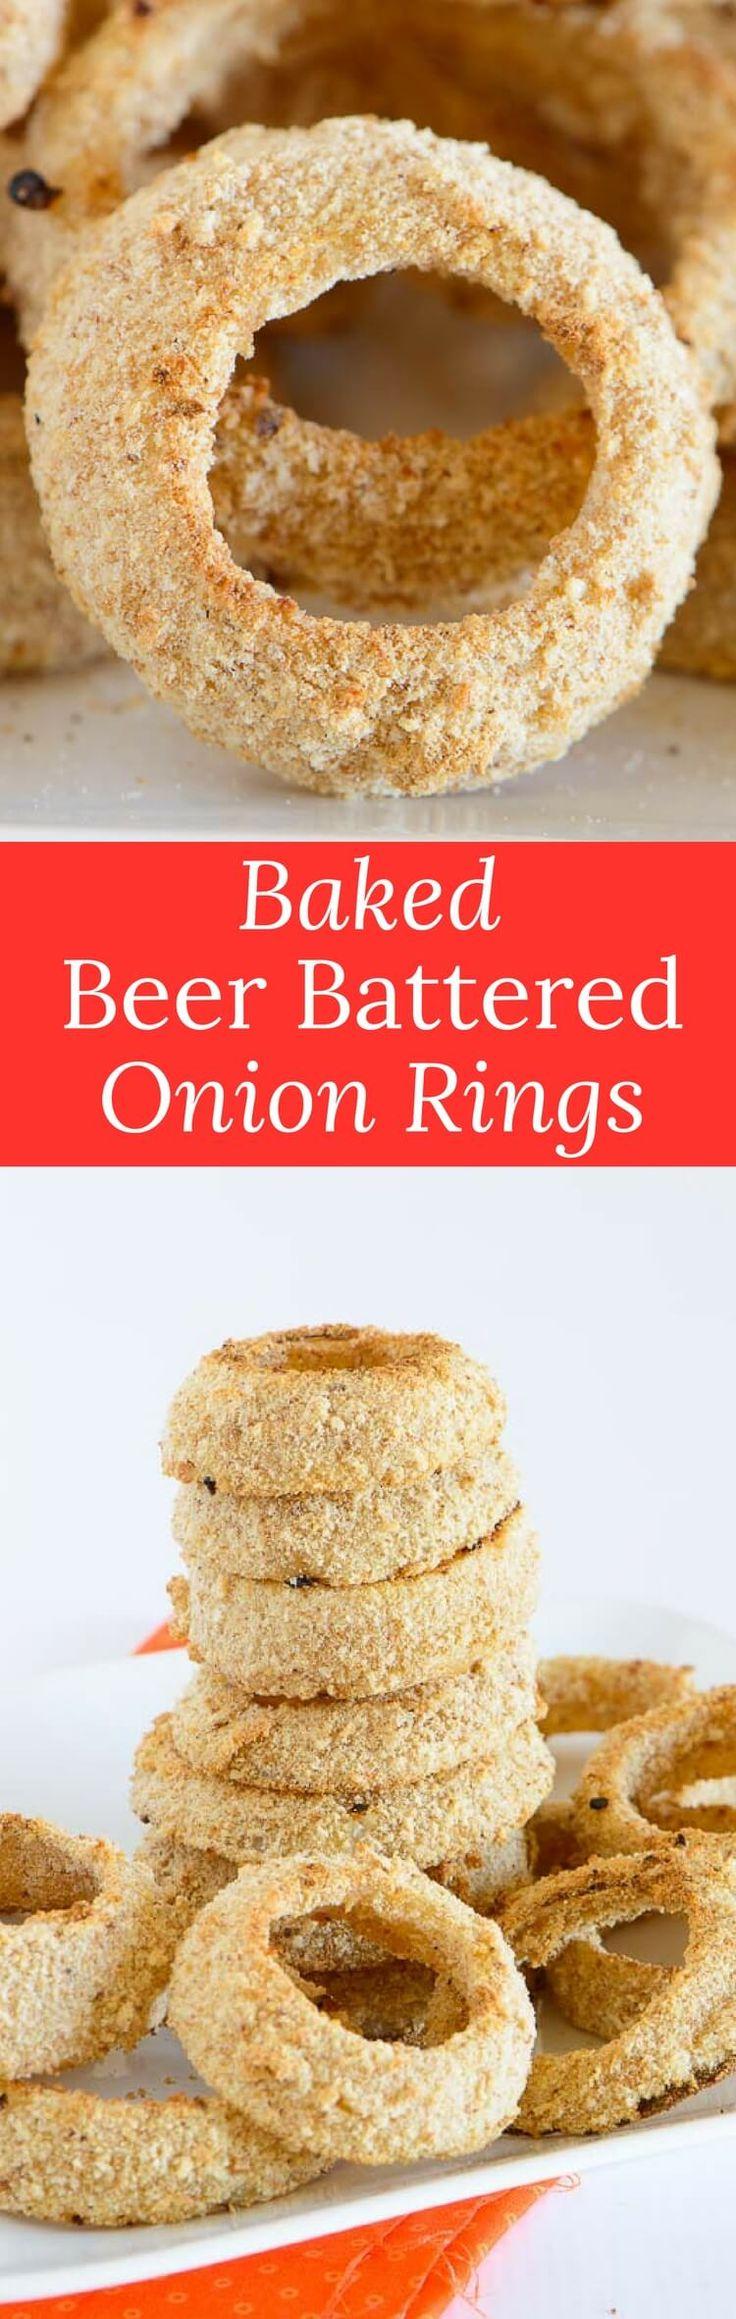 Homemade Battered Onion Rings In Oven Baked